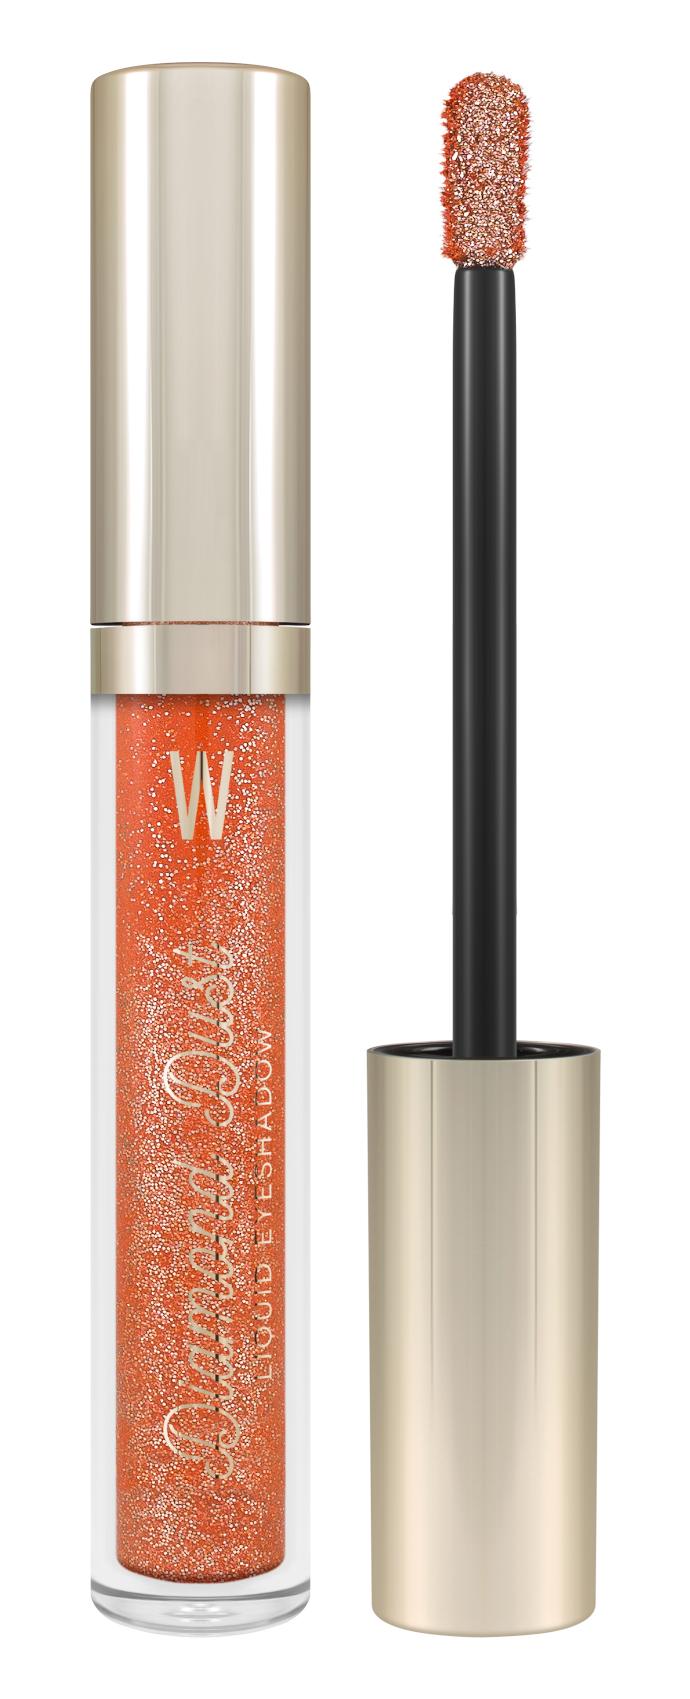 Wycon Diamond Dust Eyeshadow